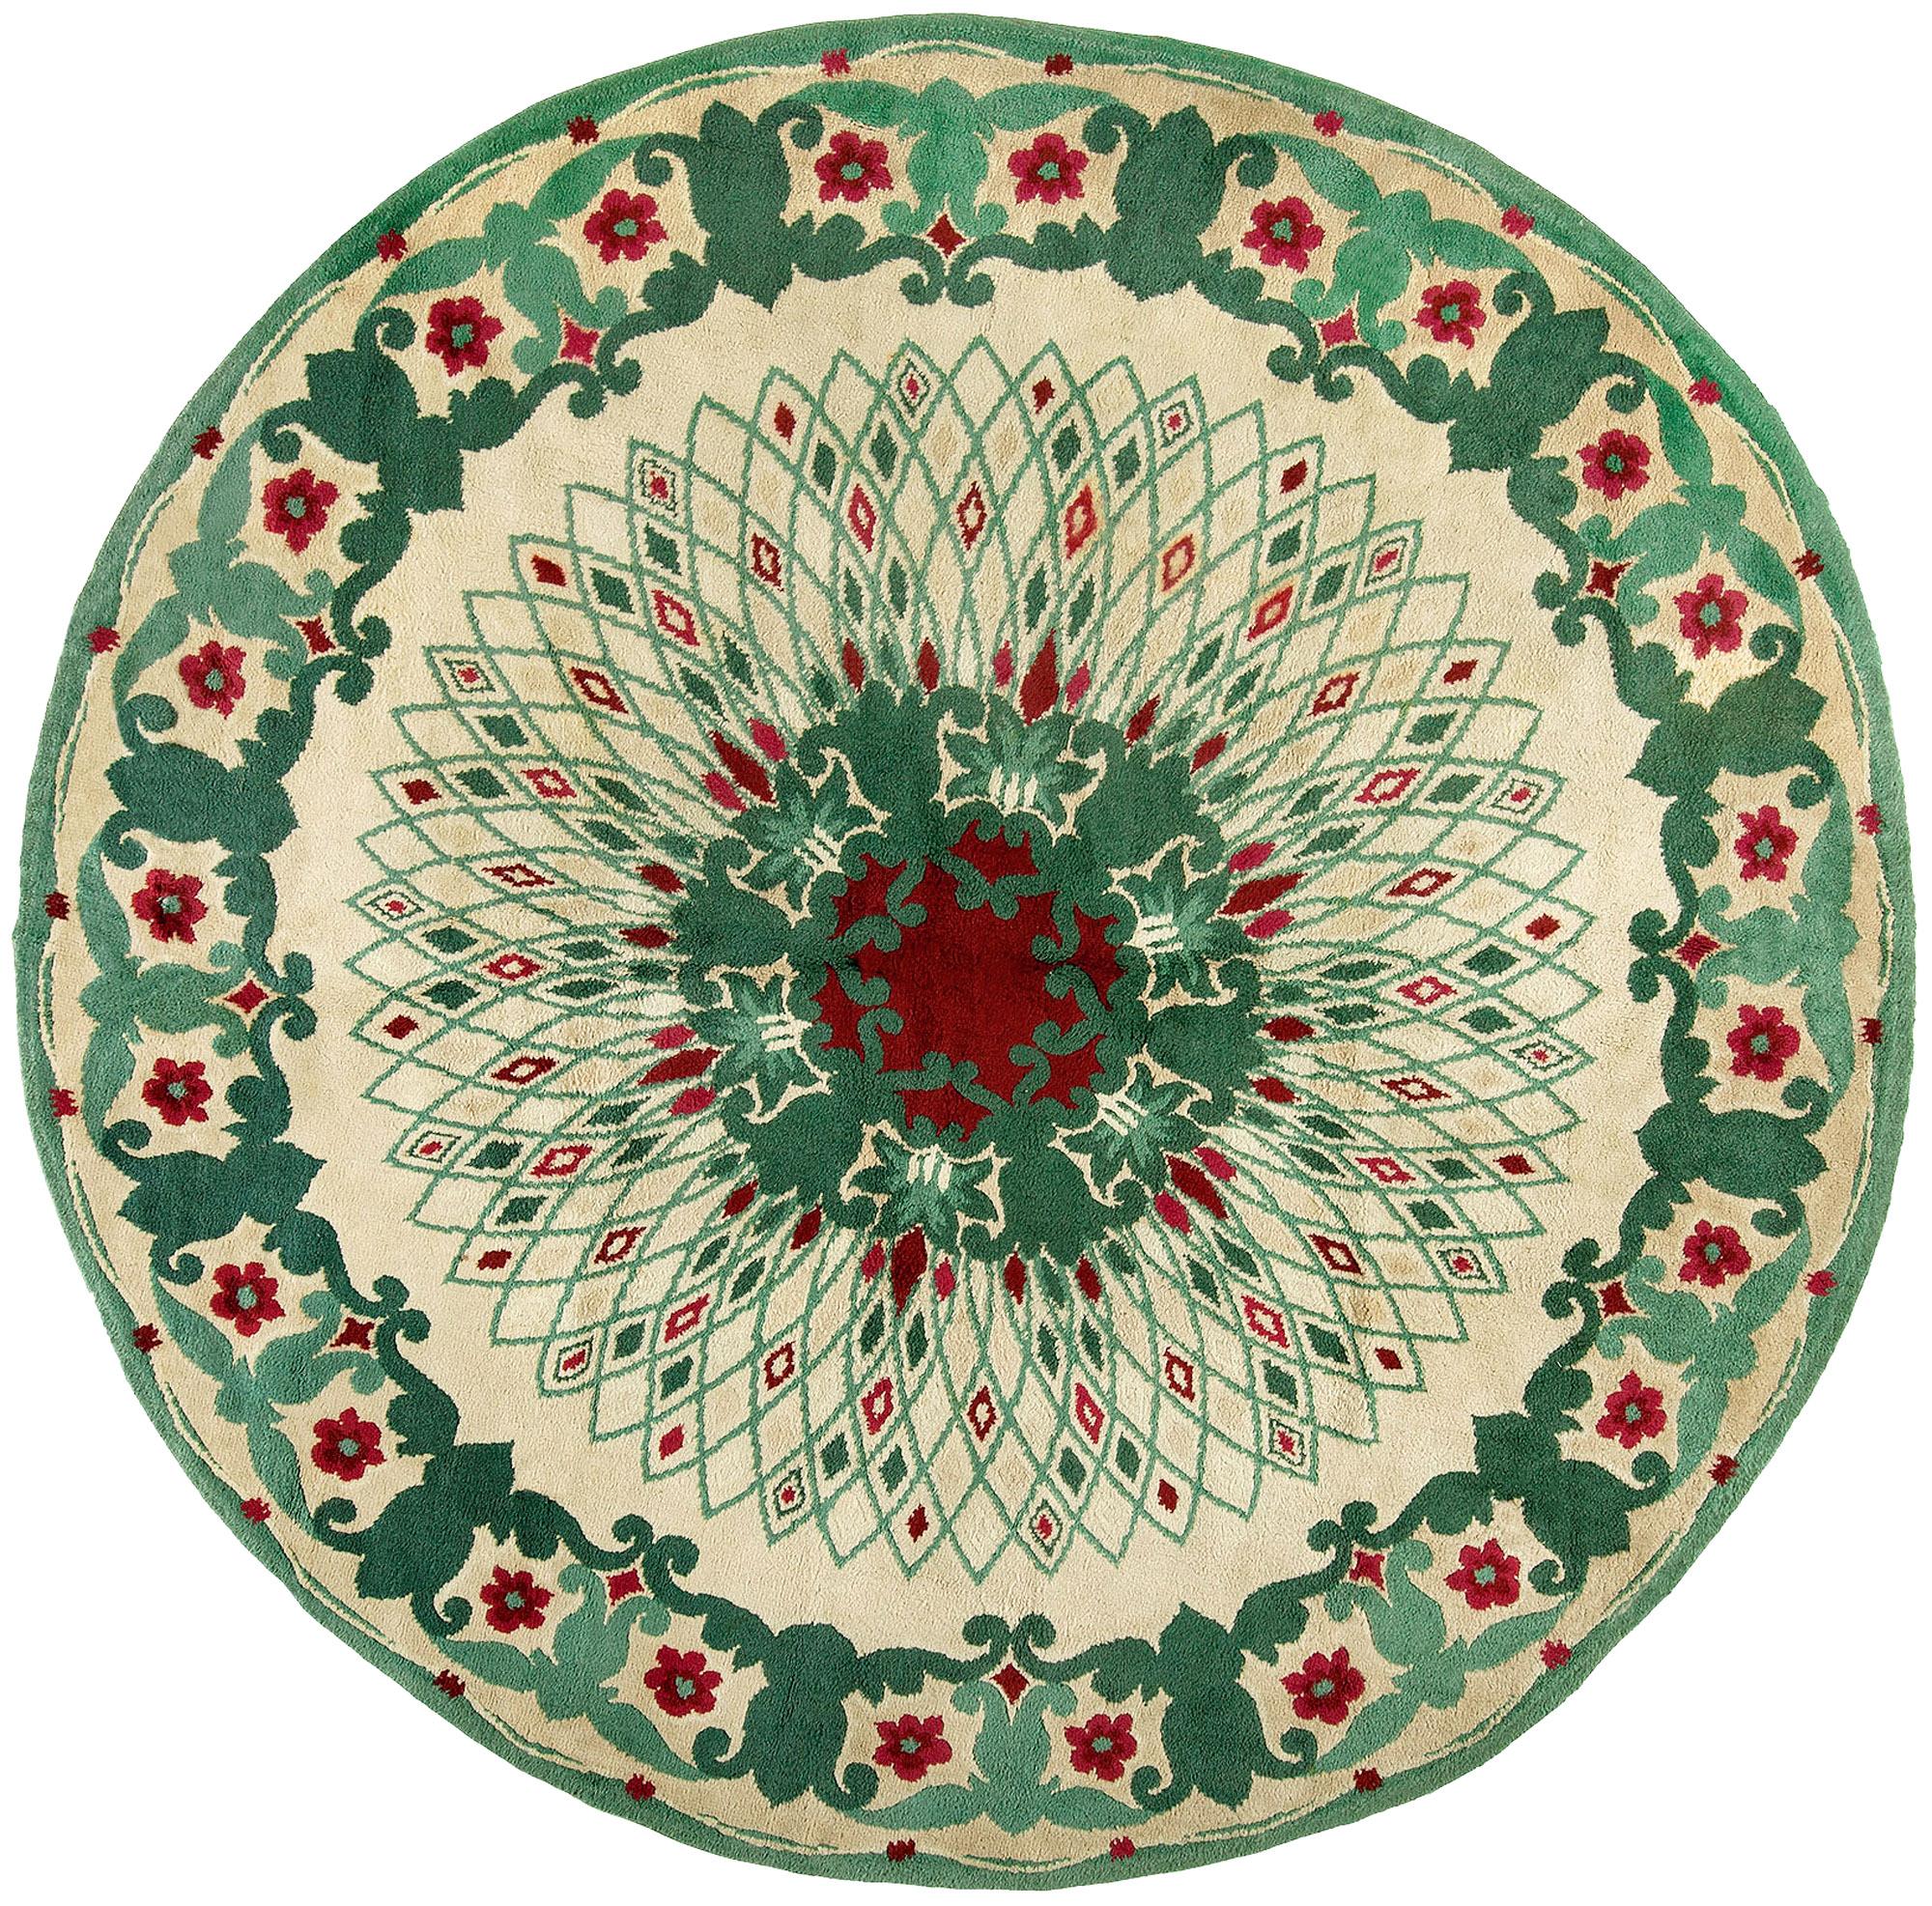 Paule Leleu Vintage Circular Rug BB4792